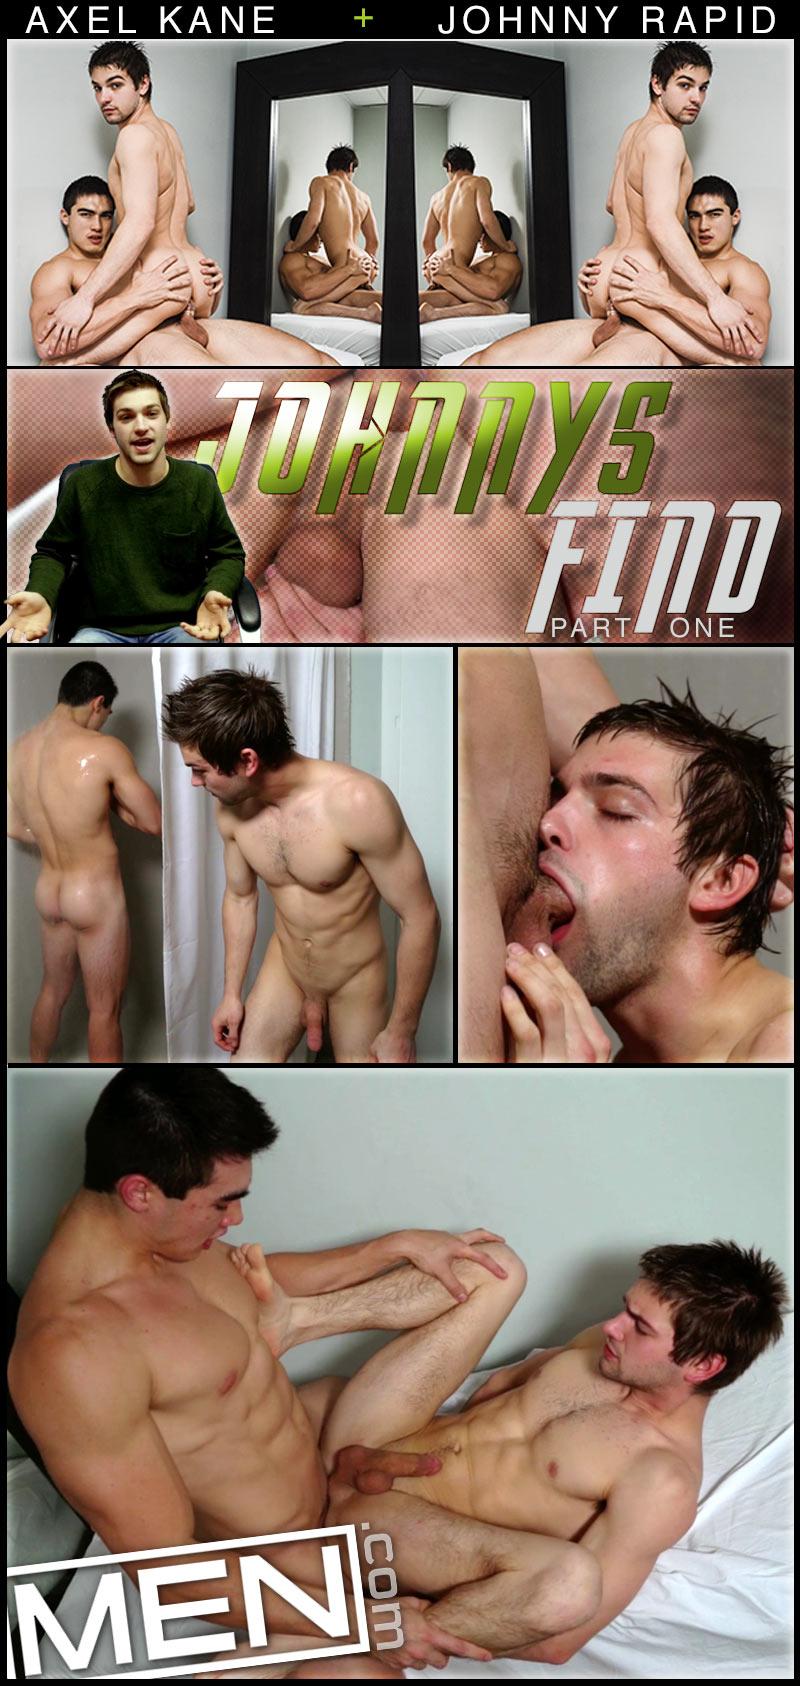 Johnny's Find (Axel Kane Fucks Johnny Rapid) at MEN